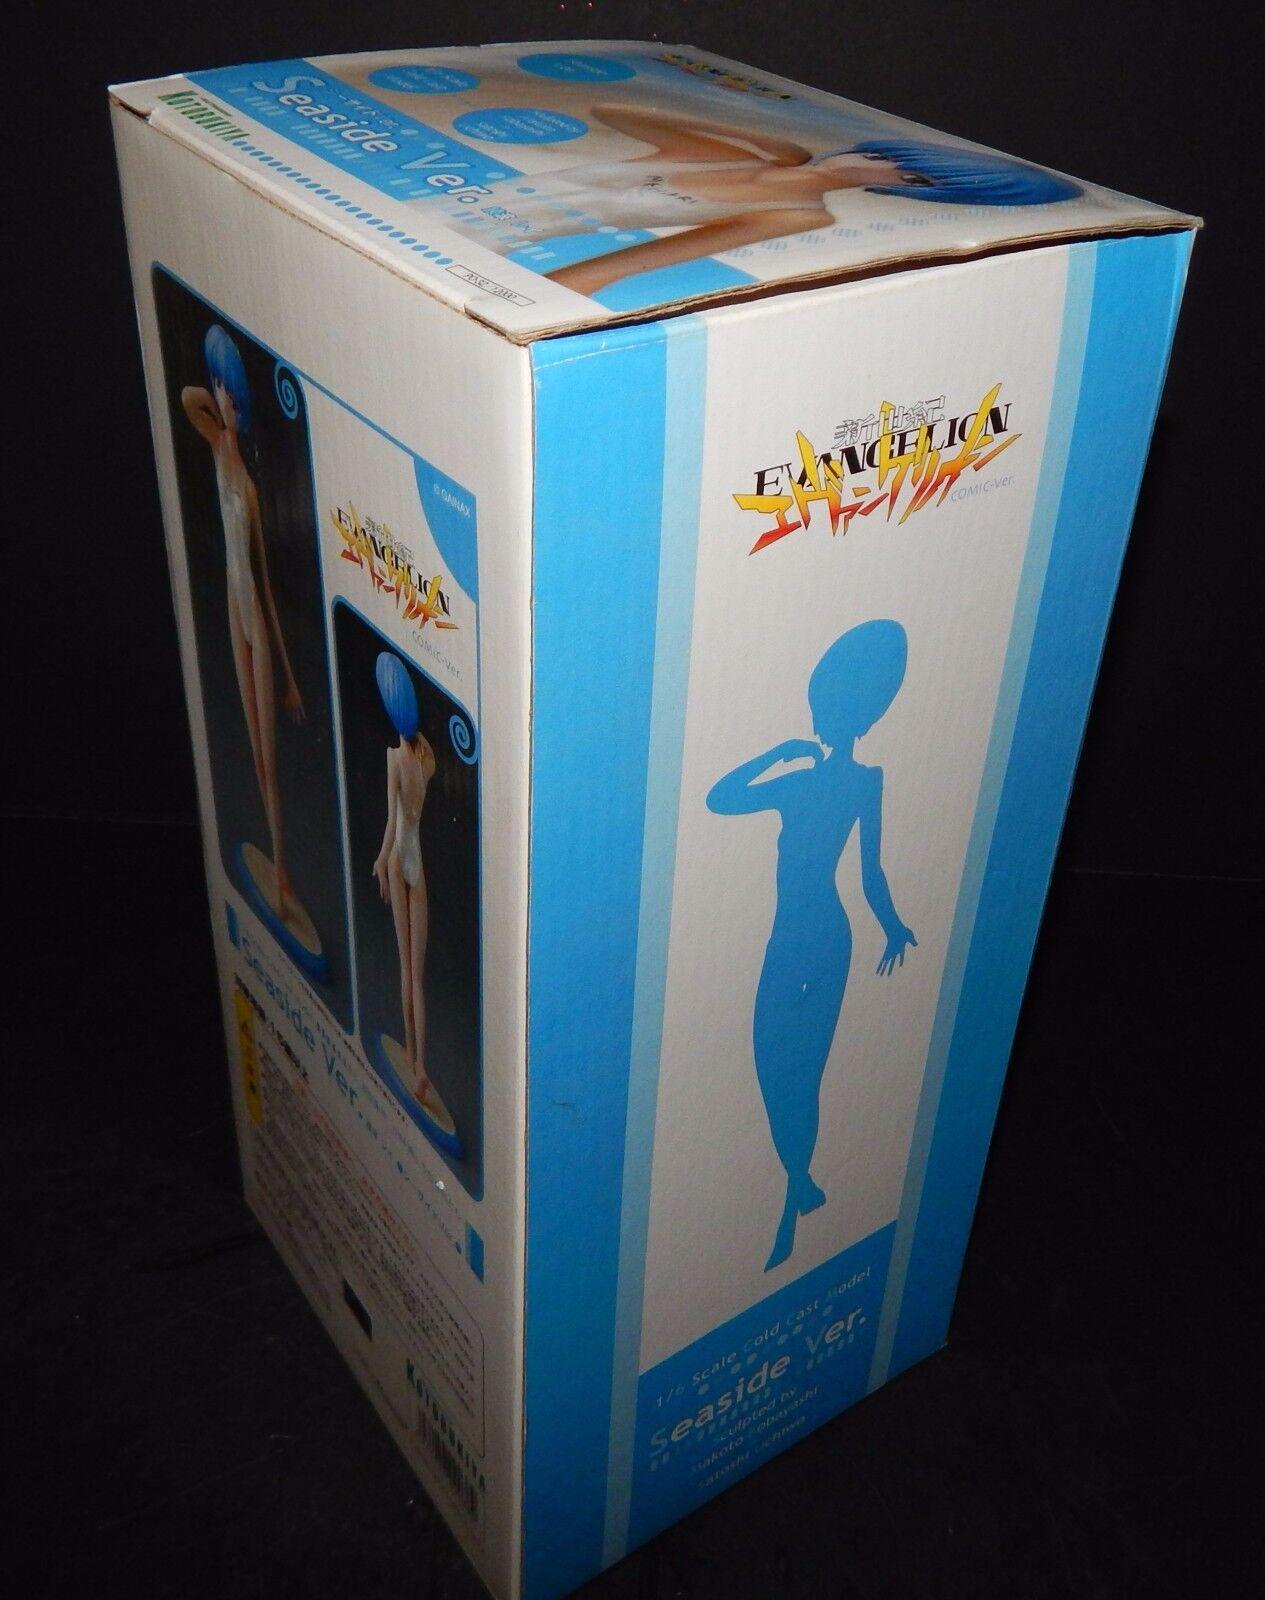 Evangelion Ayanami Rei Seaside Ver. 1/6 Scale Figure Kotobukiya Kotobukiya Kotobukiya Box Anime Statue f5c886